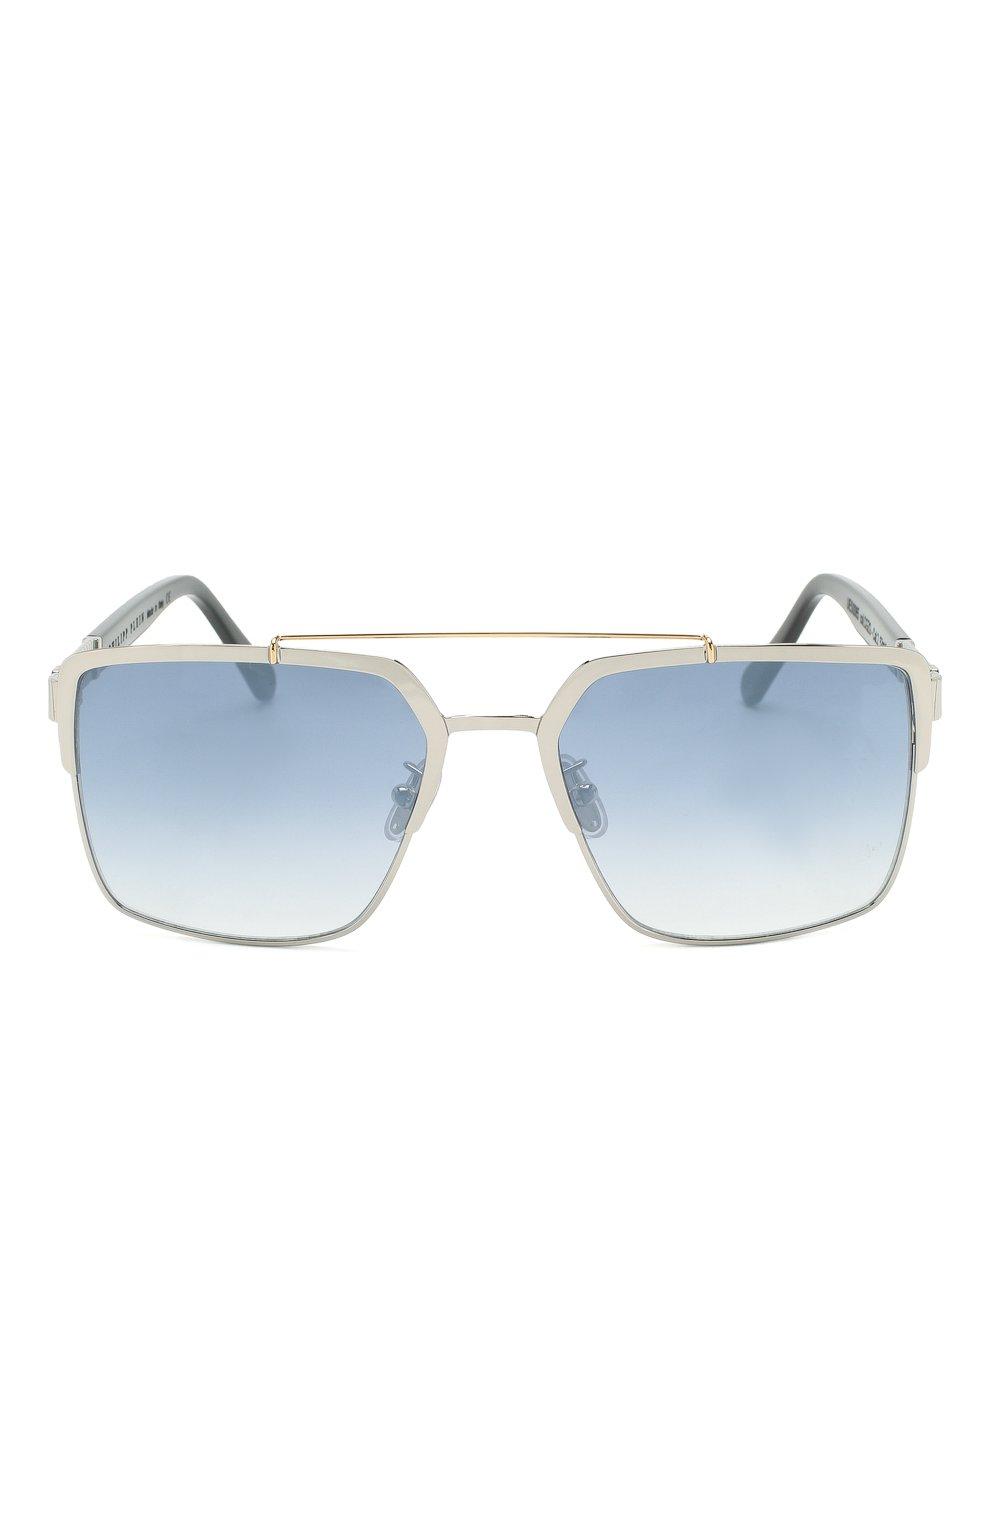 Мужские солнцезащитные очки PHILIPP PLEIN серого цвета, арт. UES0065 | Фото 2